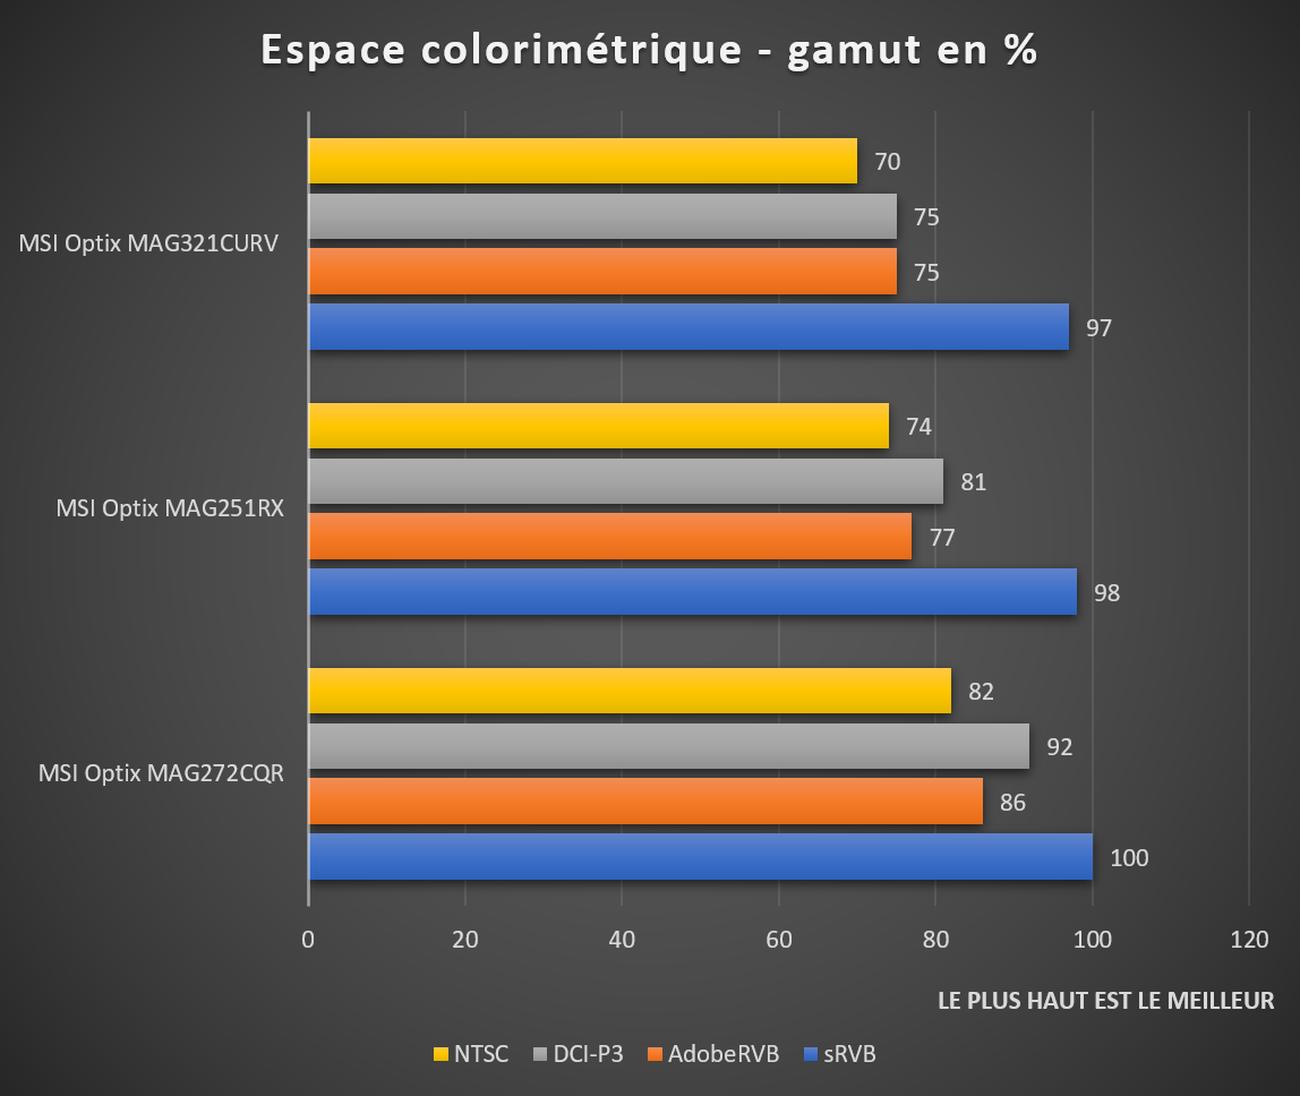 espaces colorimétriques MSI Optix MAG